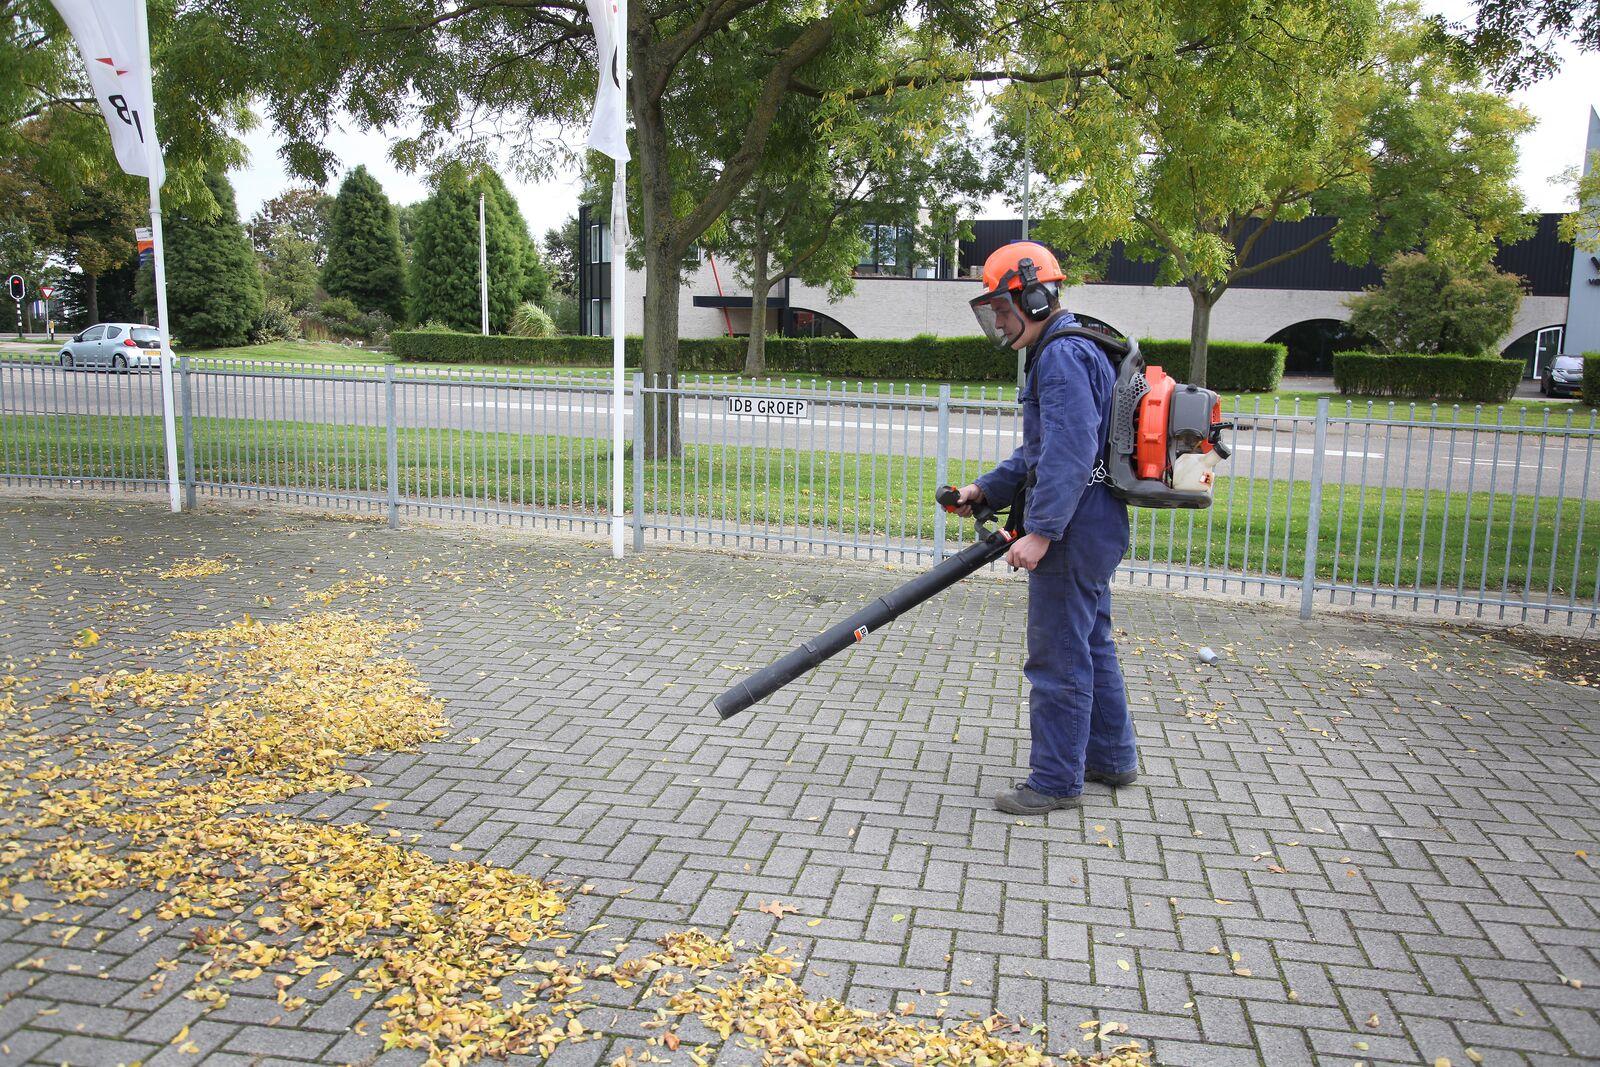 Leaf blower backpack model petrol